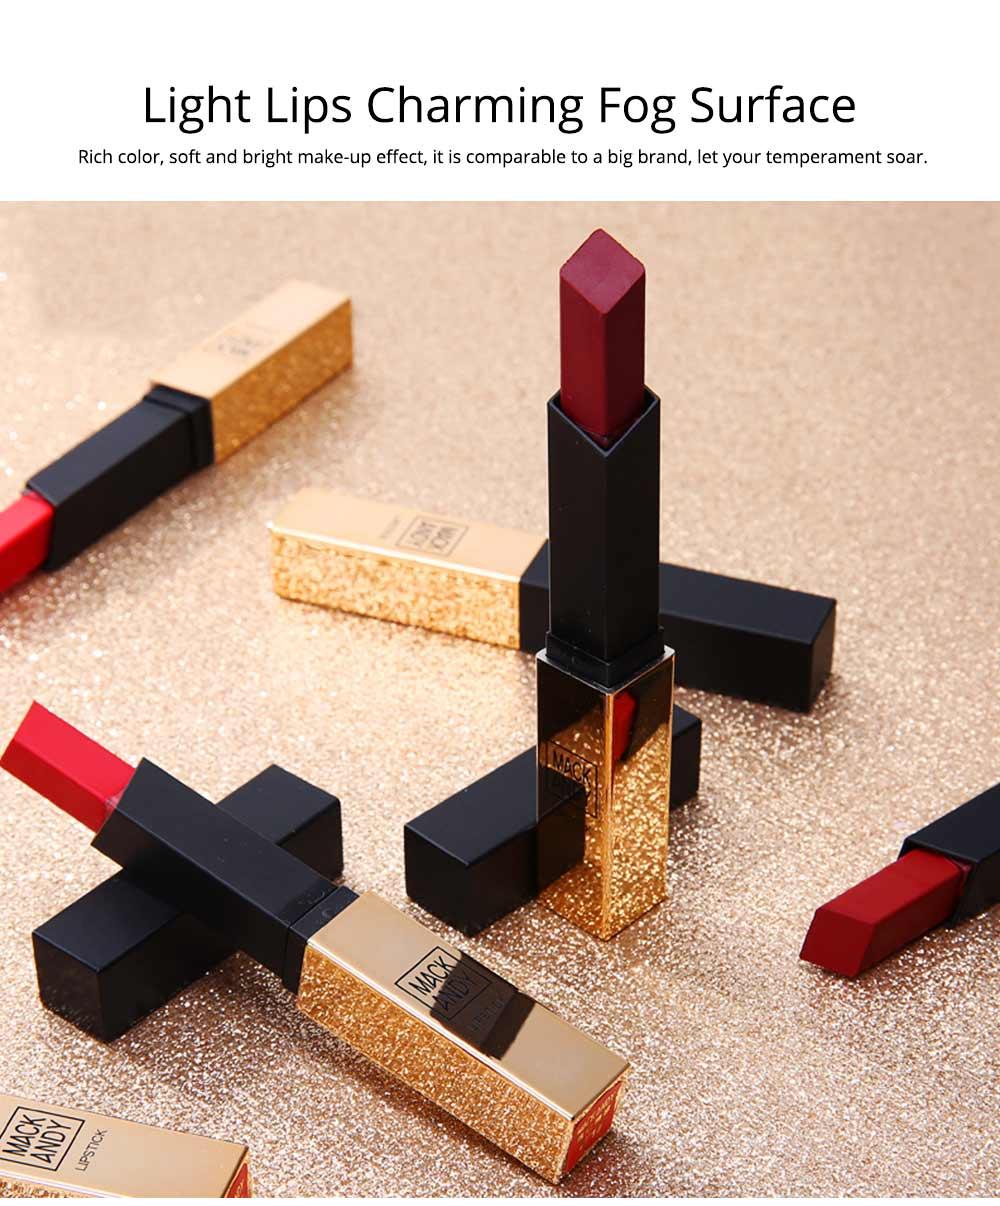 Matte Mist Face Lipstick with Little Gold Tube, Durable Light Stickiness Small Gold Bar Matte Lipstick for Girls 3